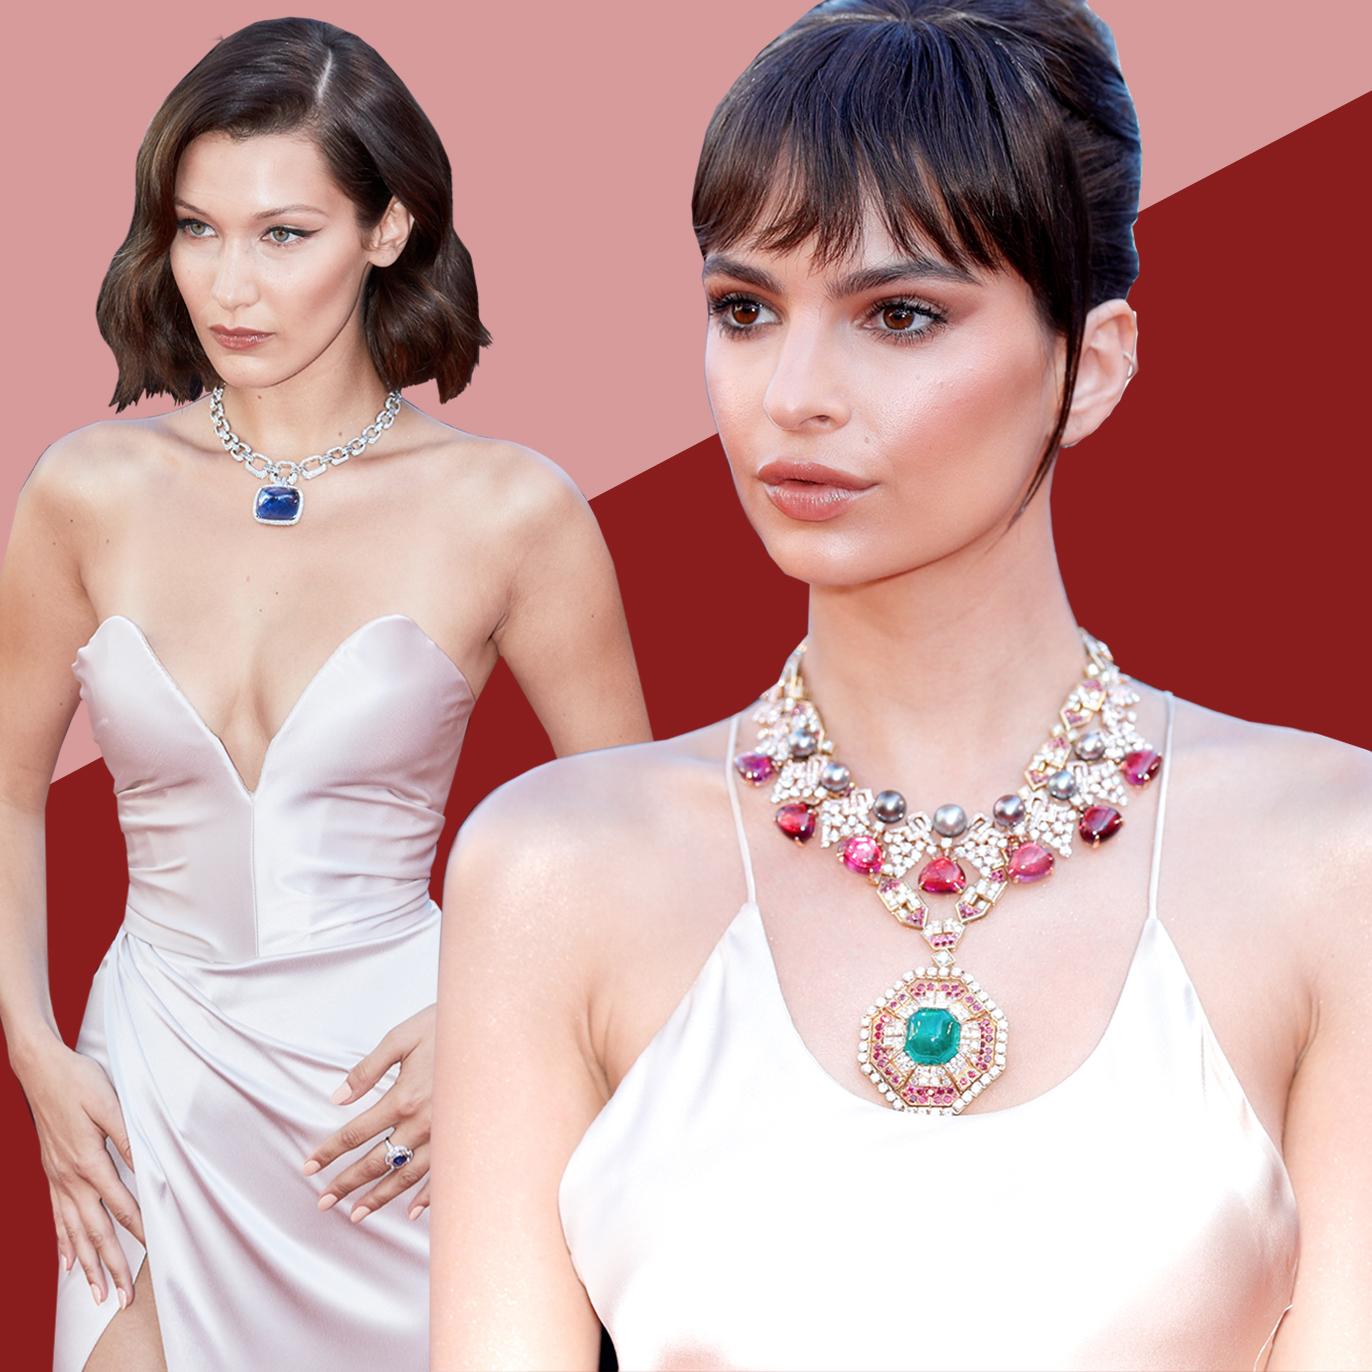 Steal her style: Bella Hadid & Emily Ratajkowski's twinning Cannes looks